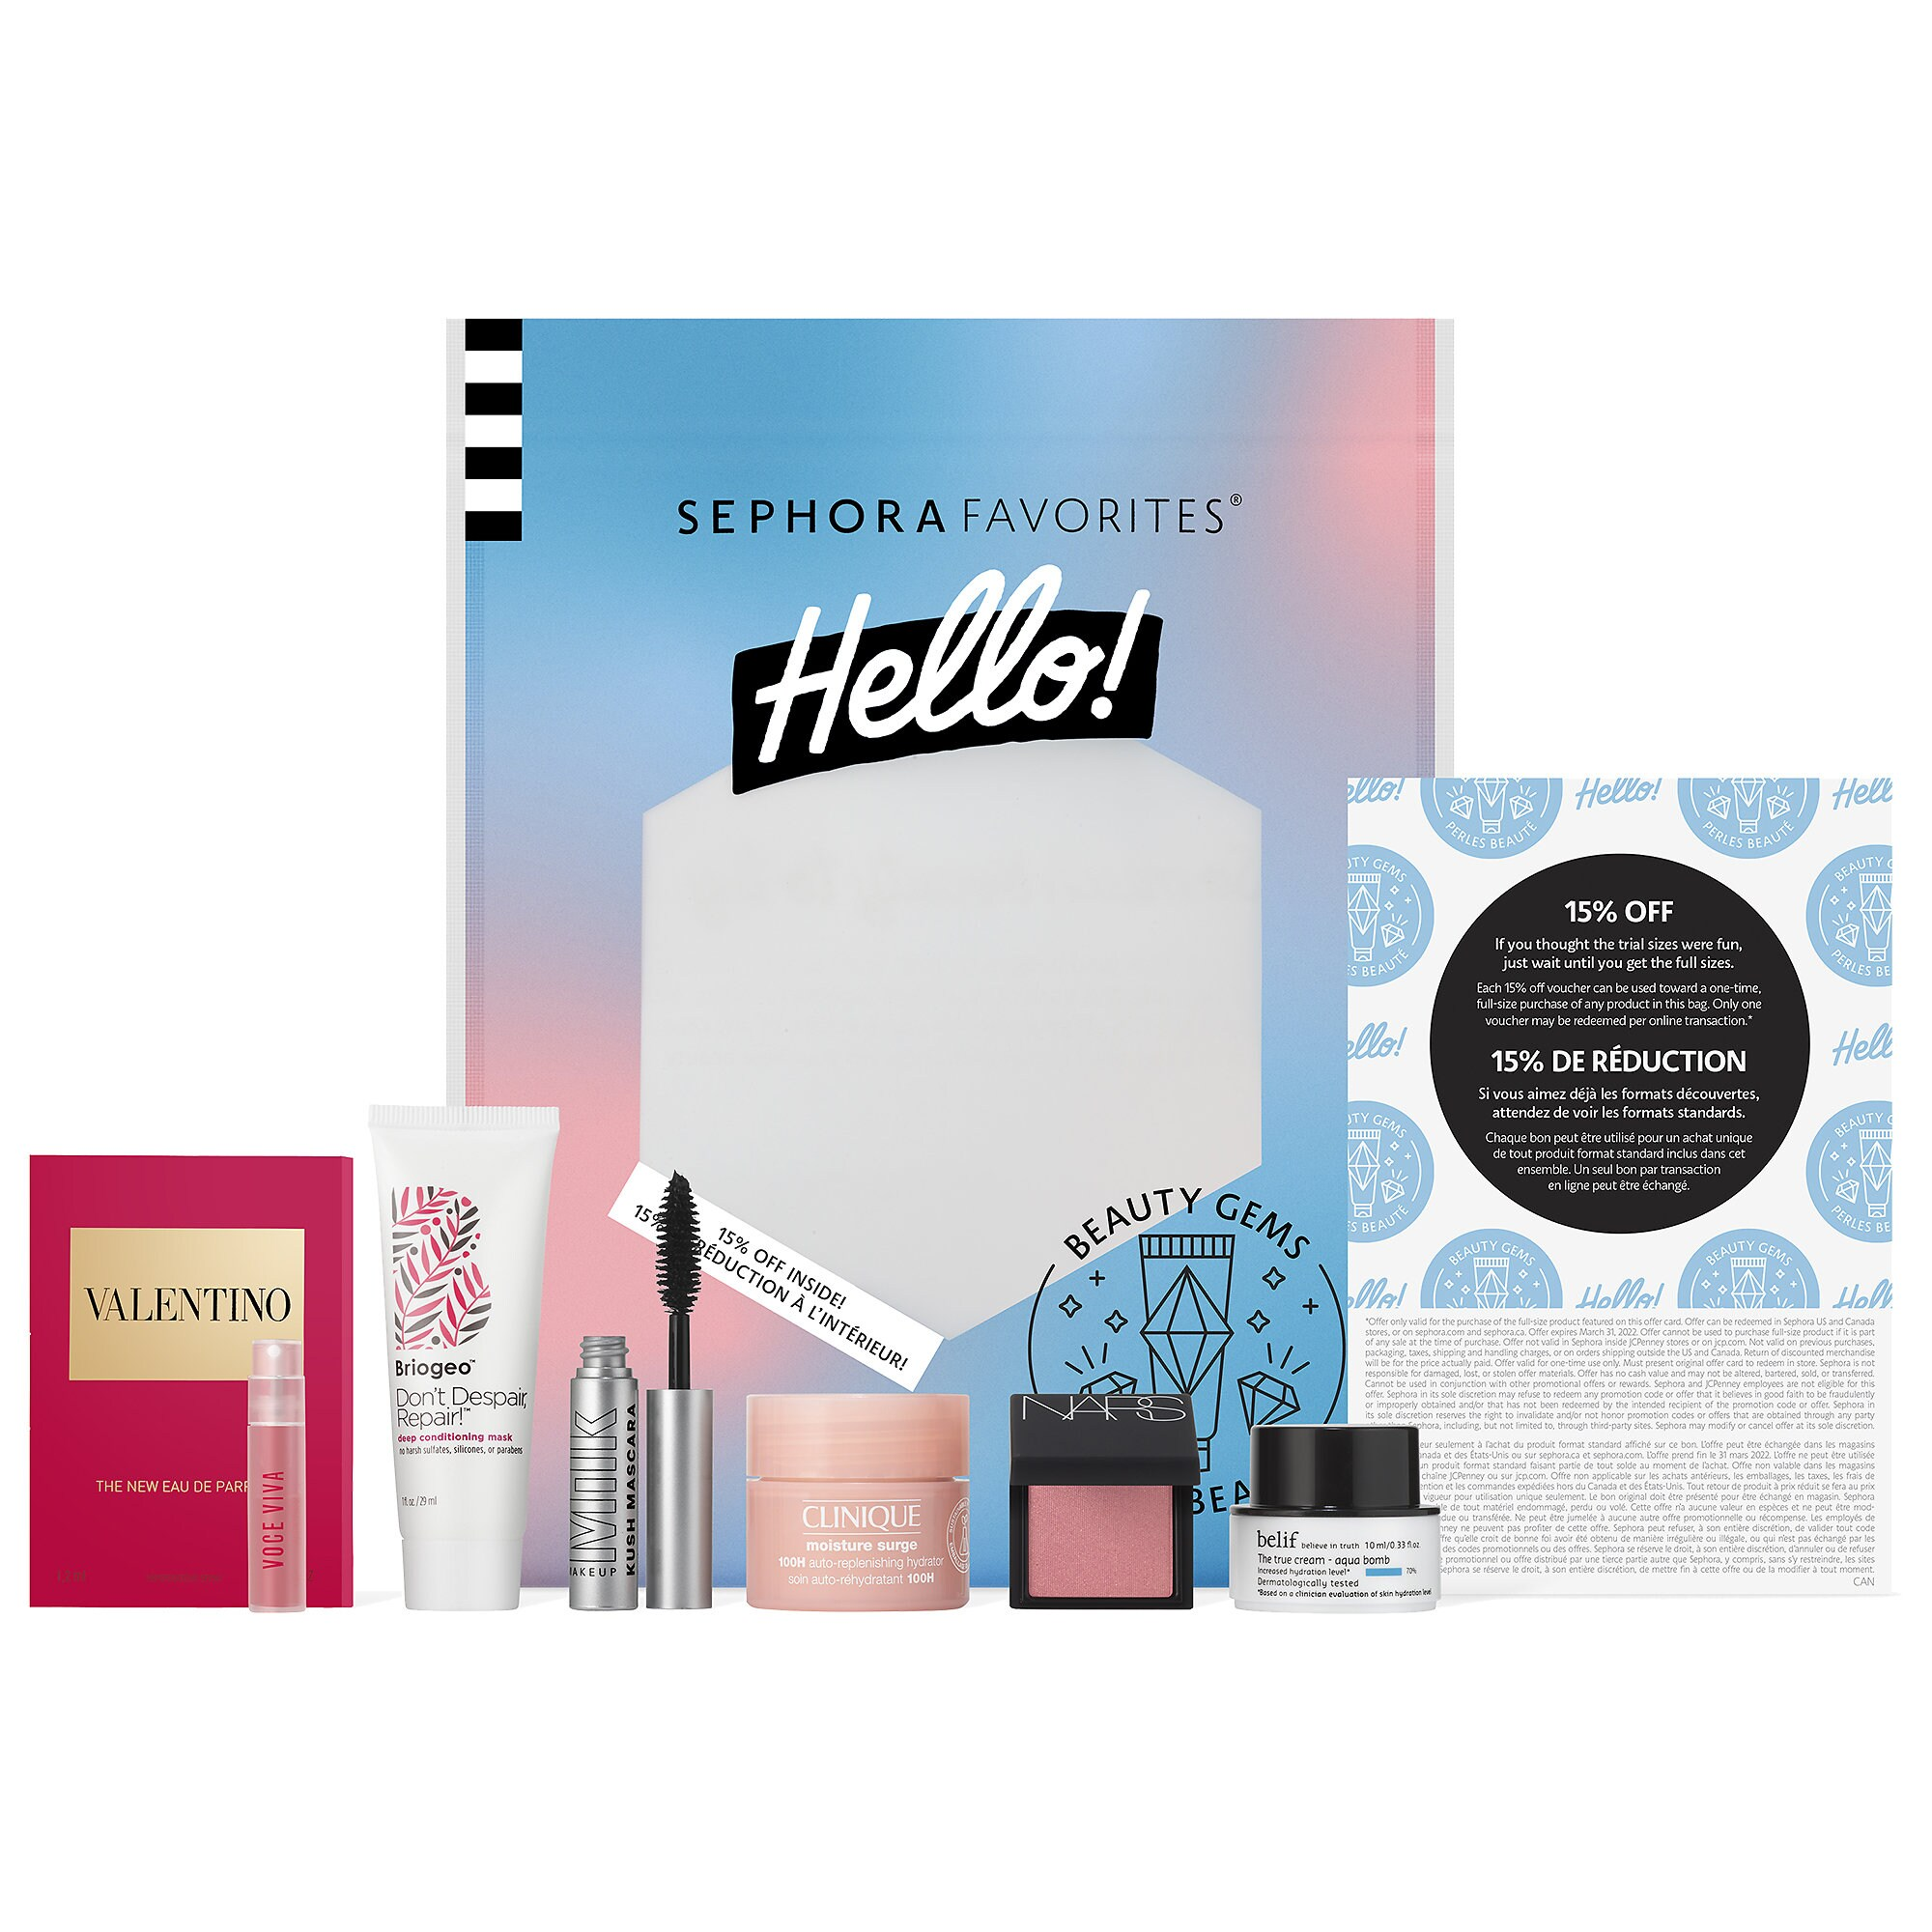 Sephora Hello! Beauty Gems